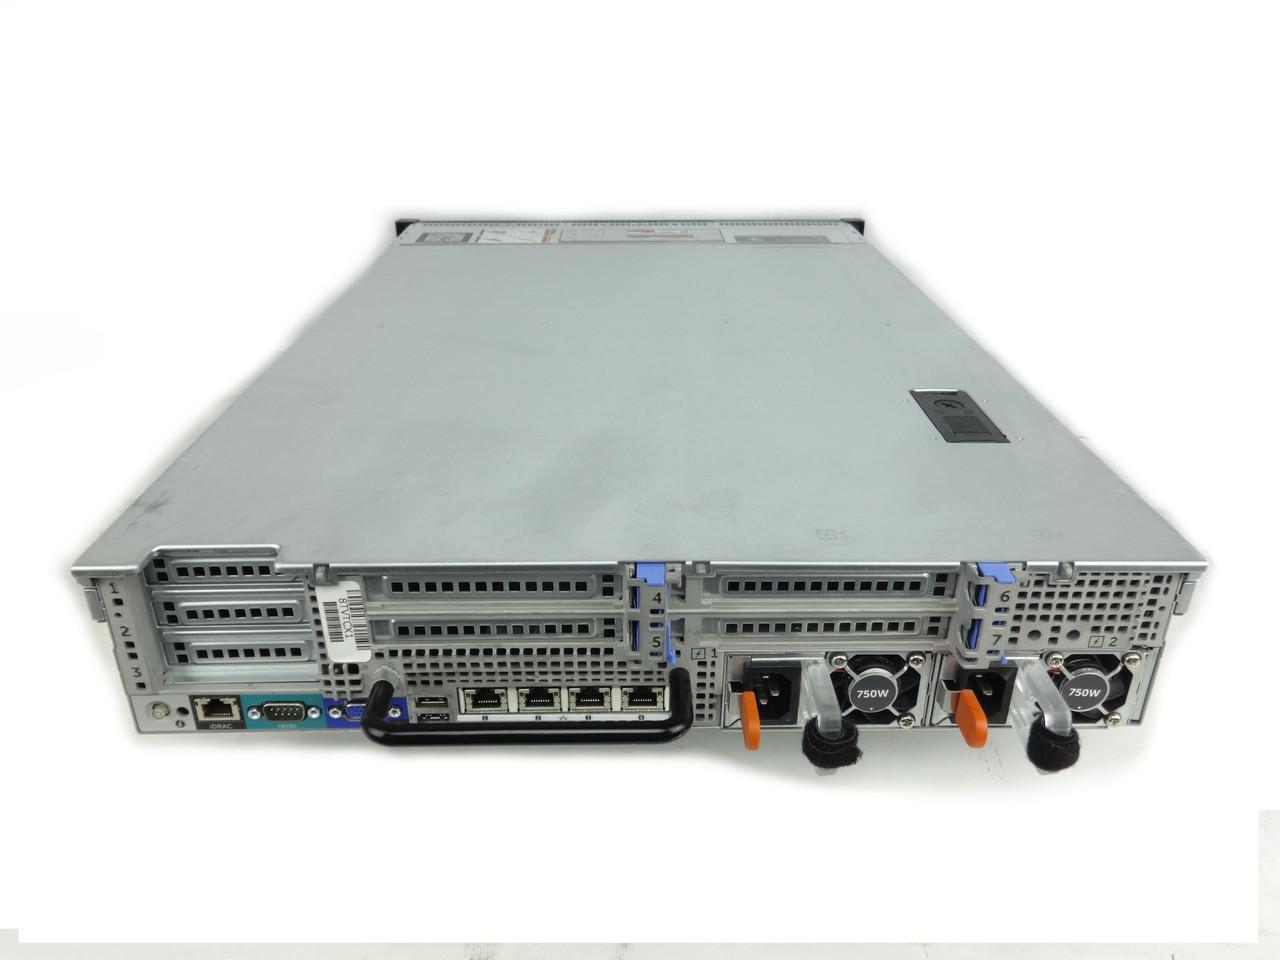 Dell Poweredge R720 8 LFF Server Back